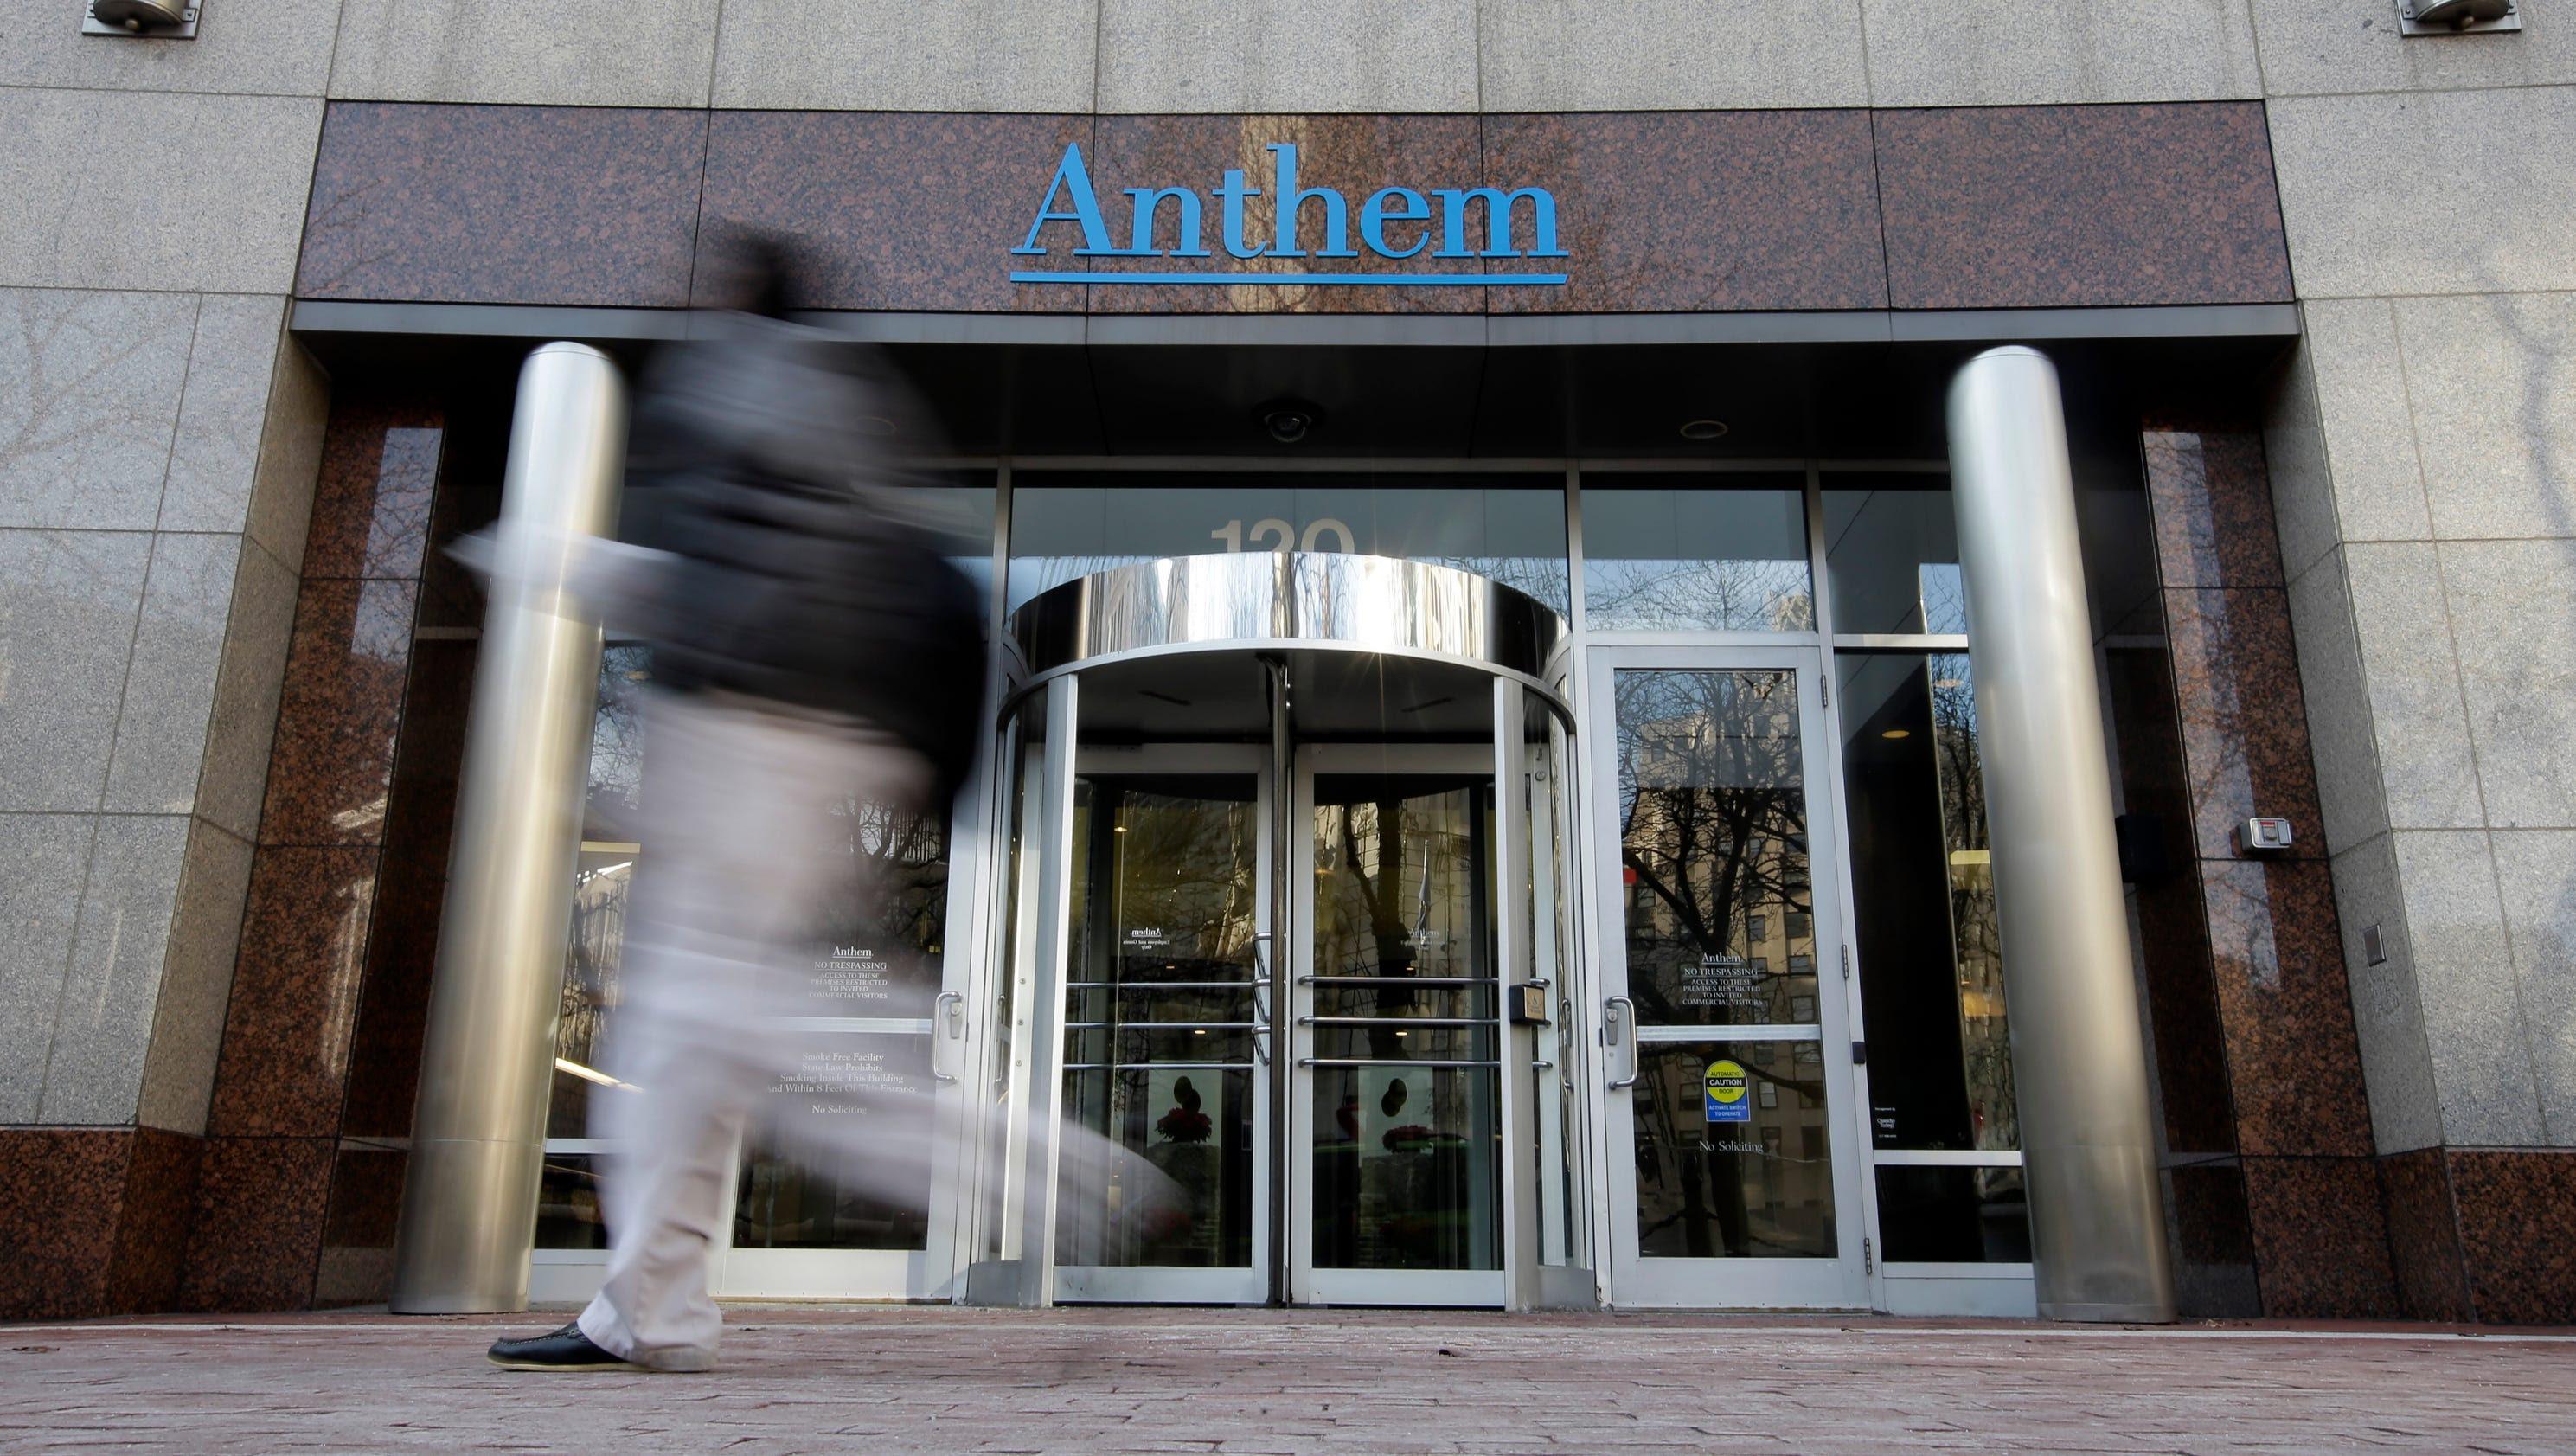 Massive breach at health care company Anthem Inc.